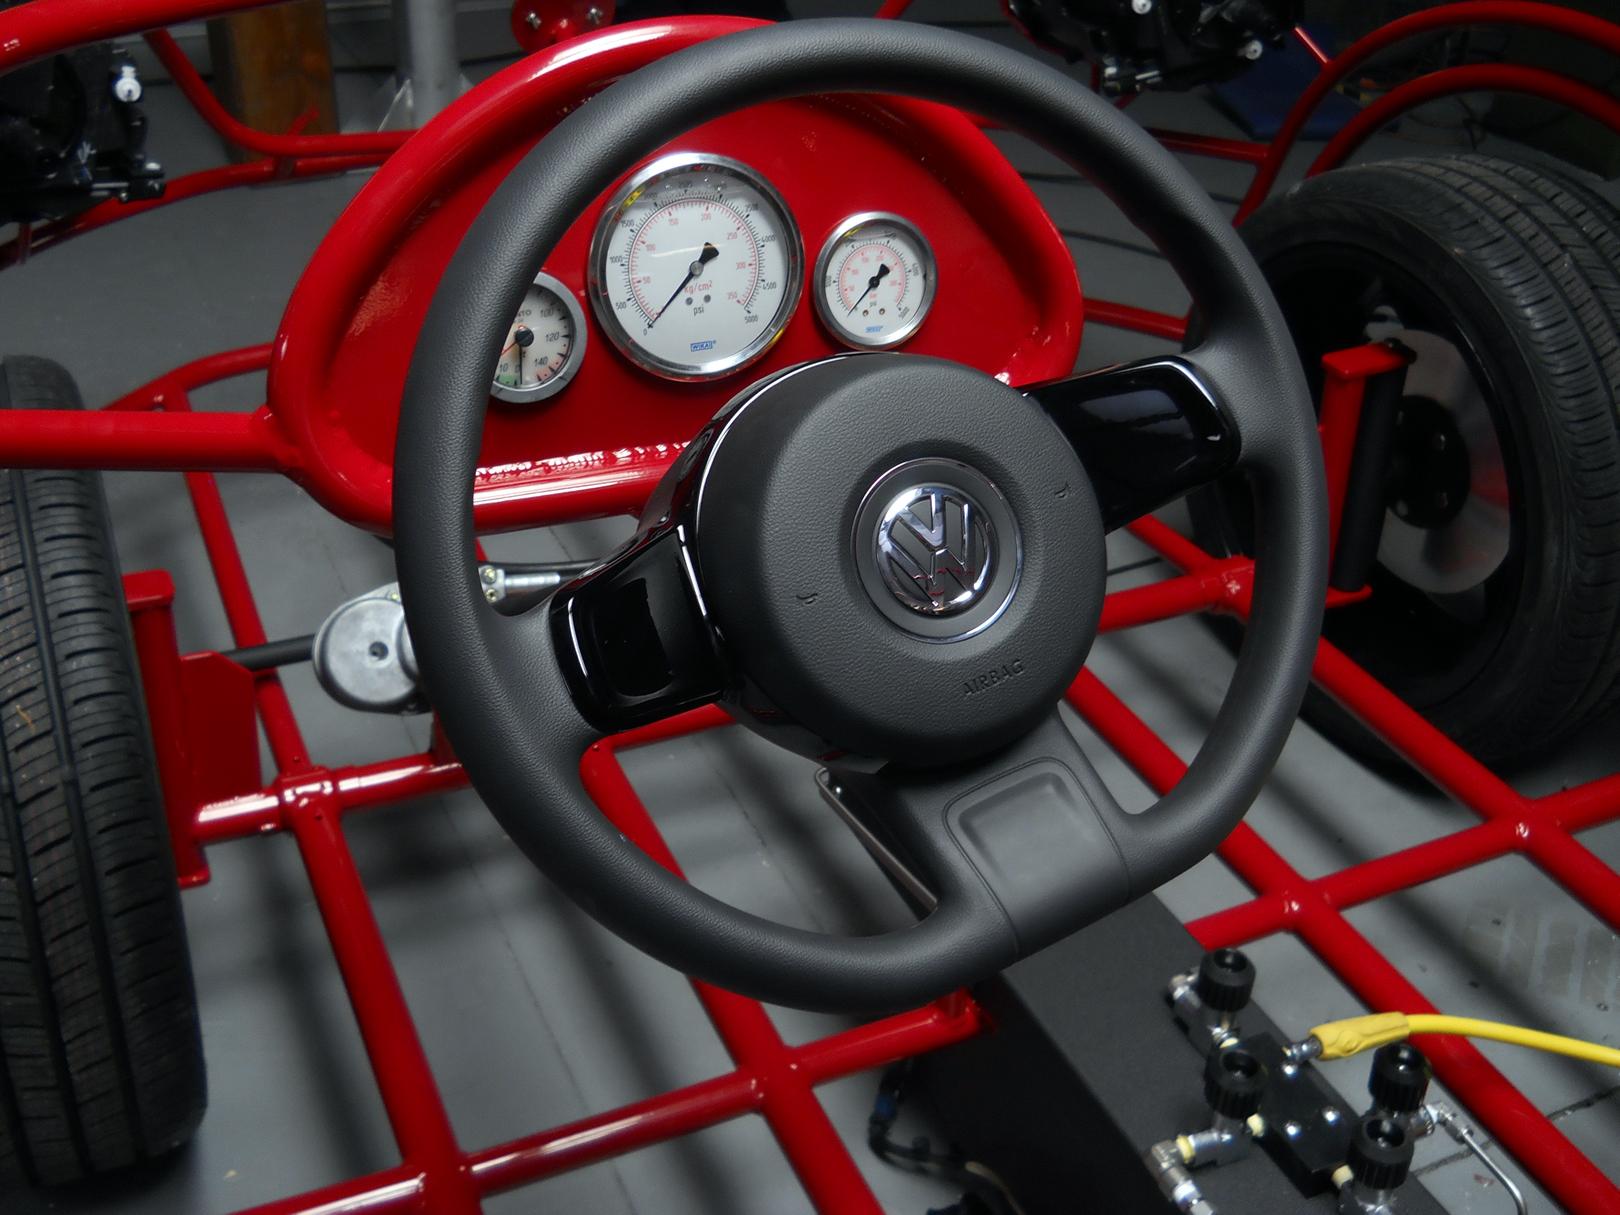 SteeringWheelandDash